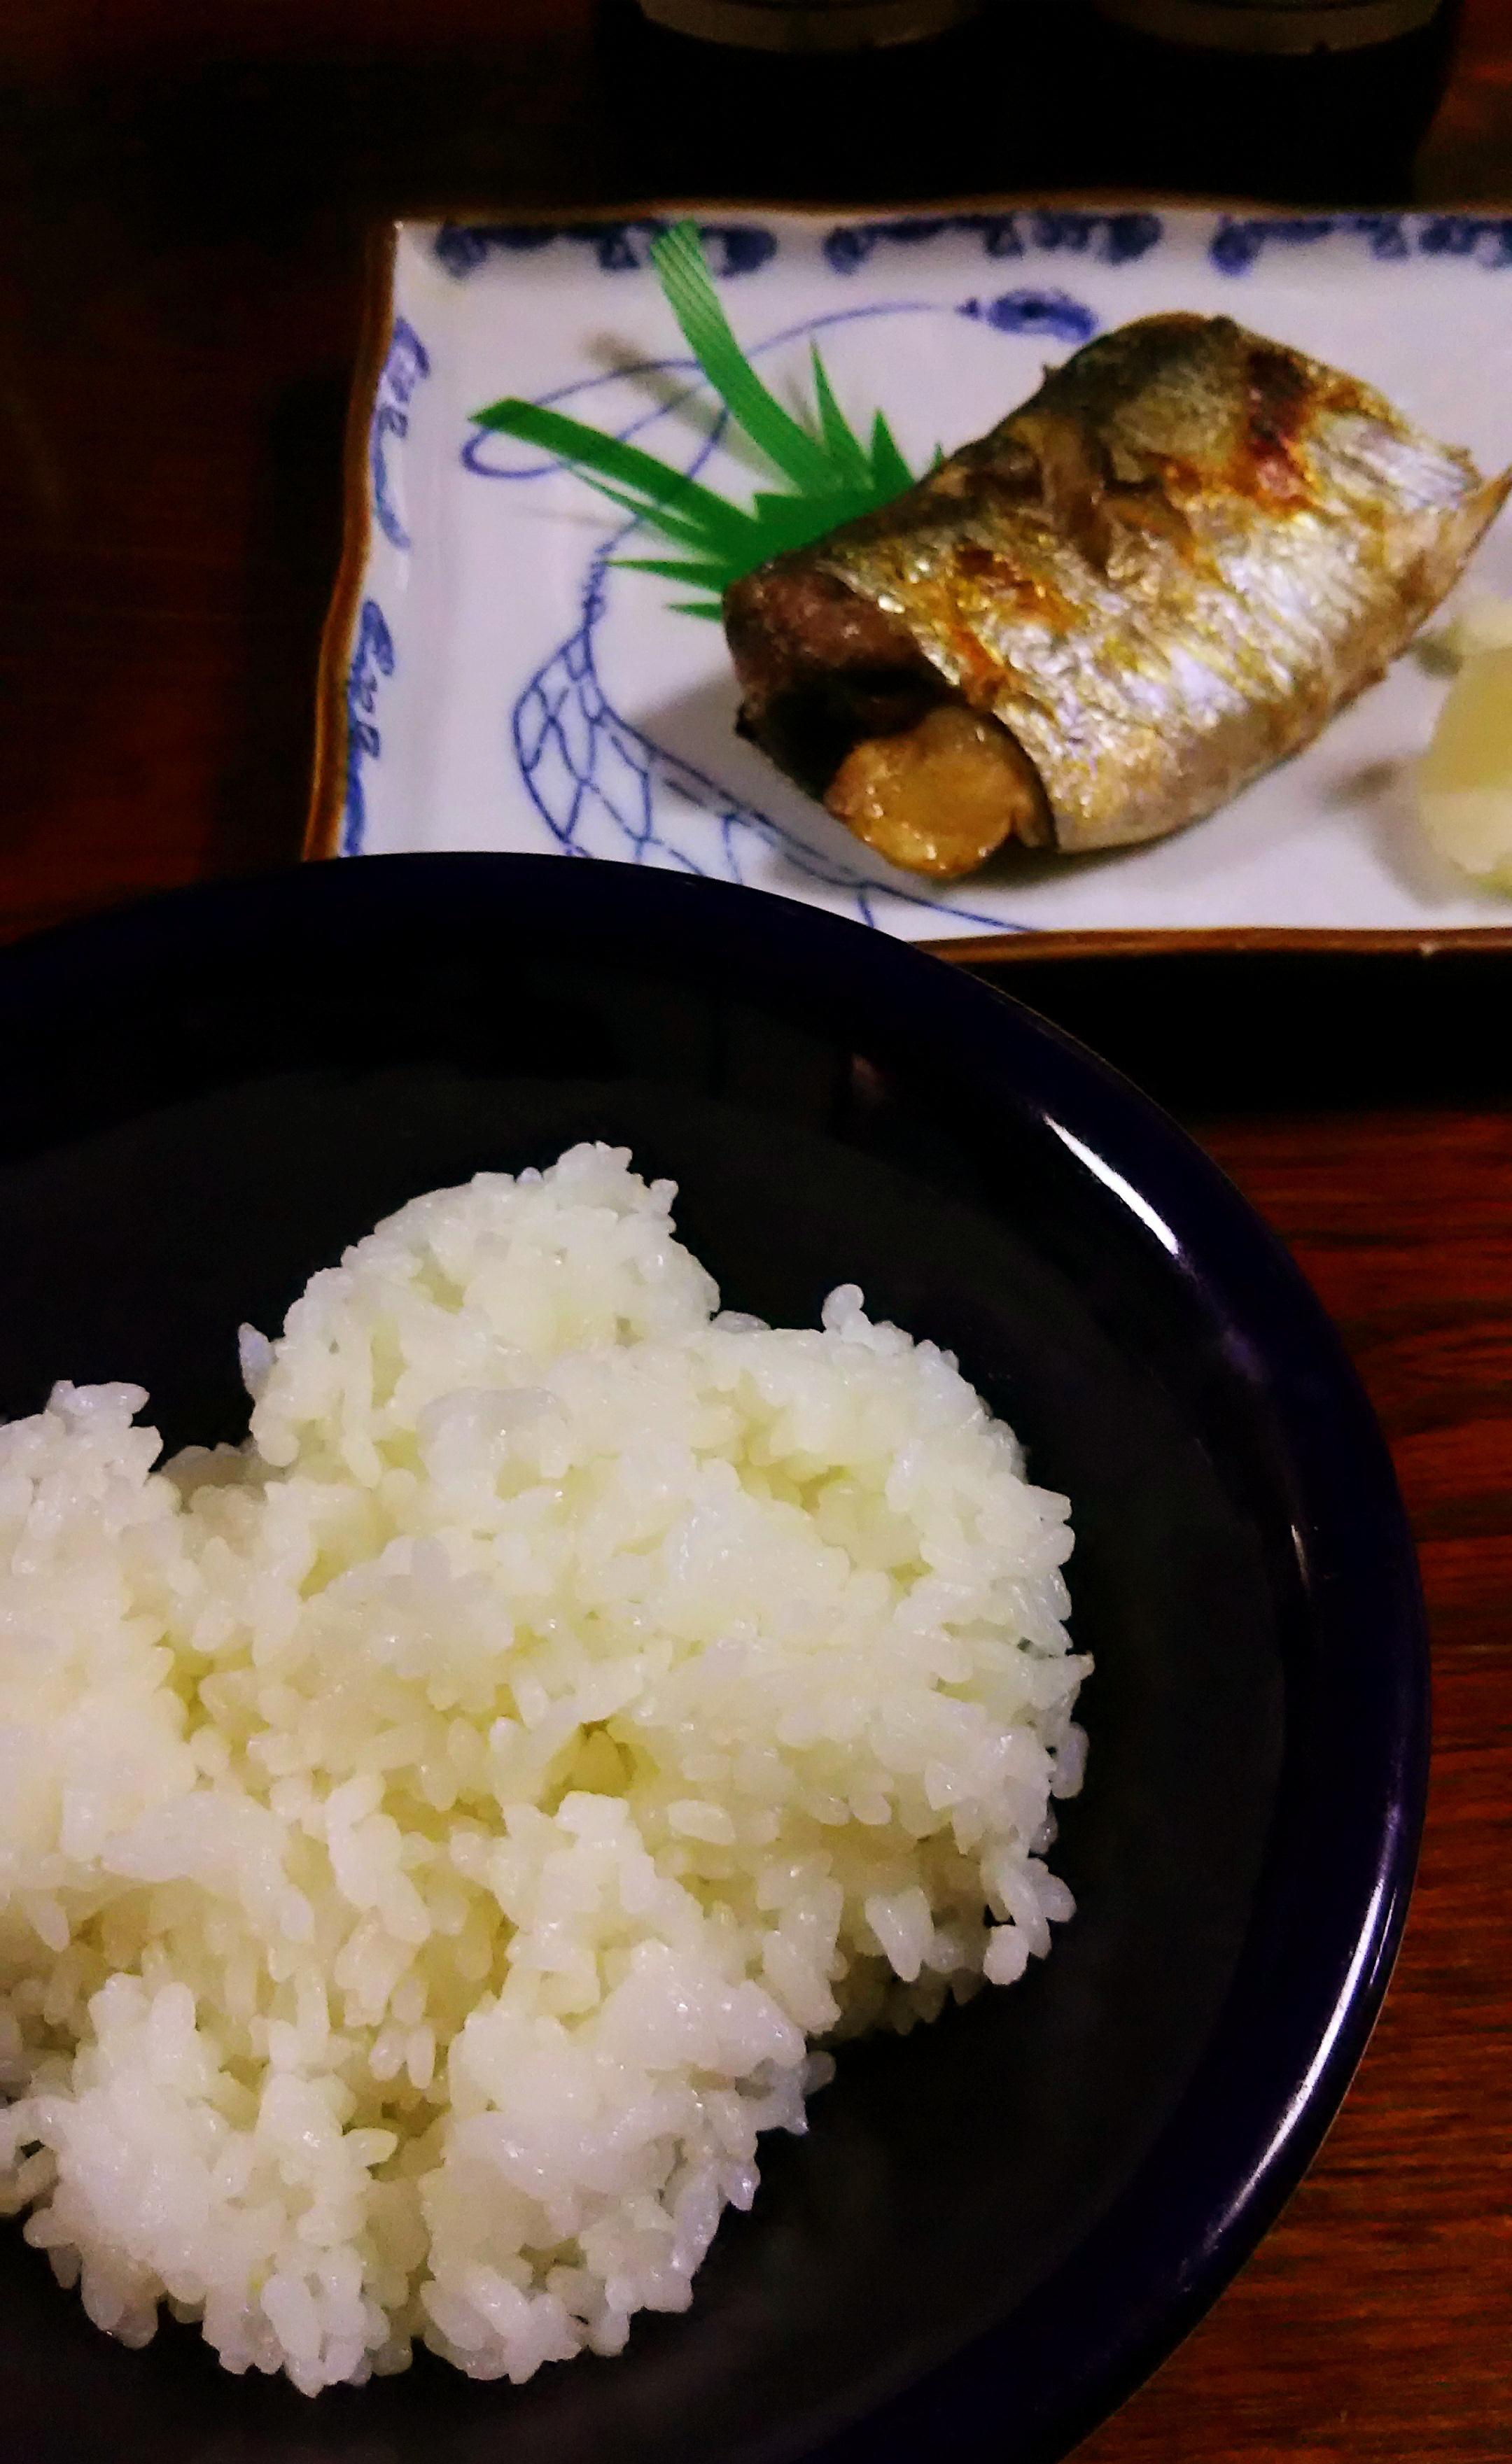 http://www.fukukomachi.com/blog/photo/C360_2017-04-05-19-08-26-178.jpg